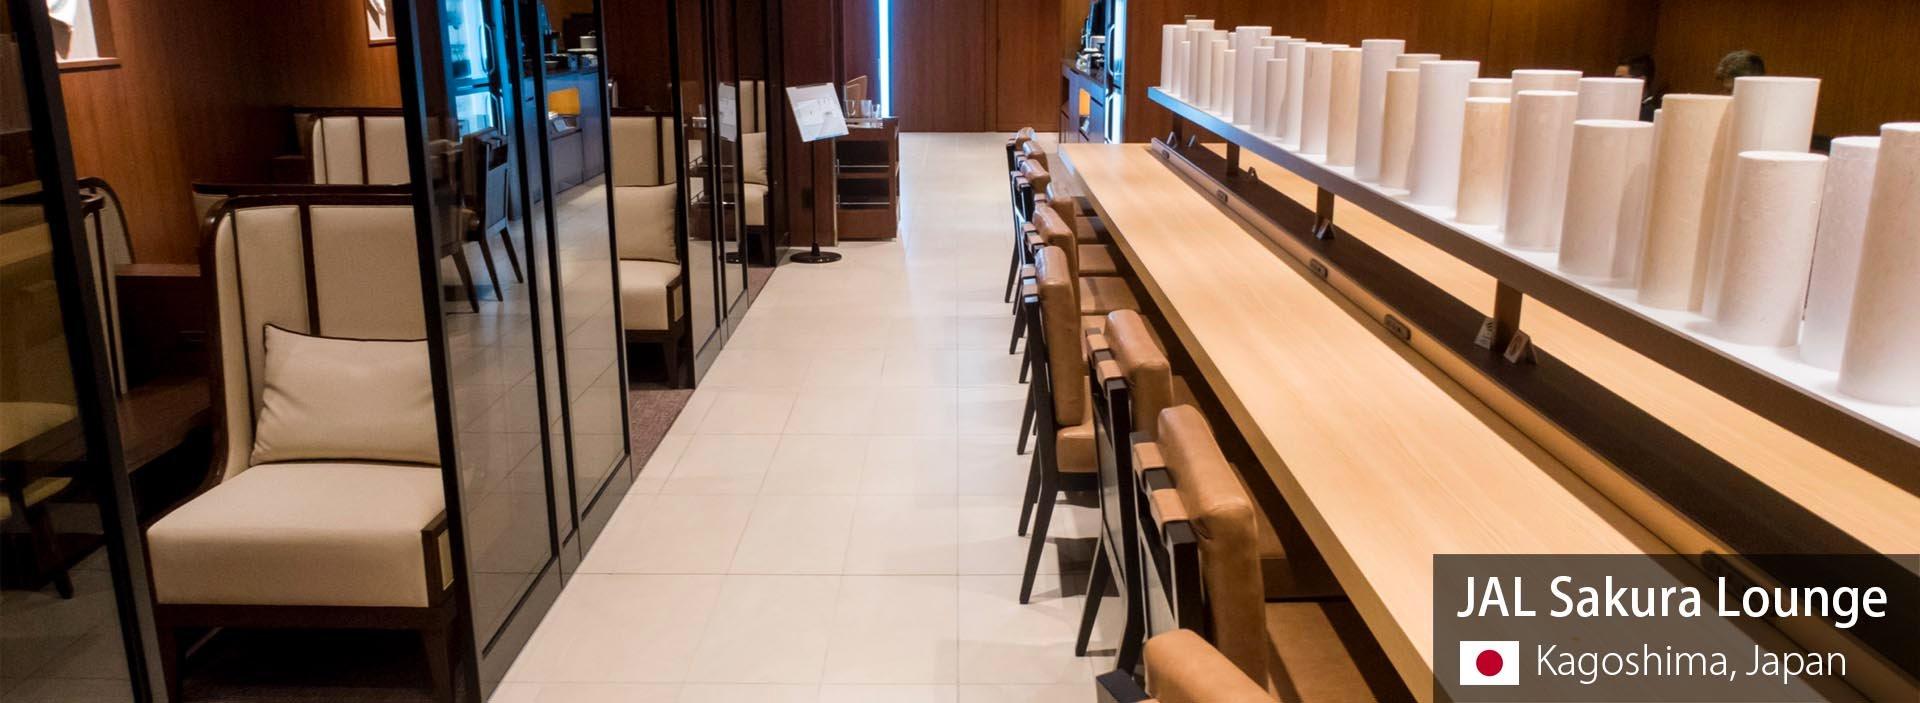 Review: JAL Sakura Lounge at Kagoshima